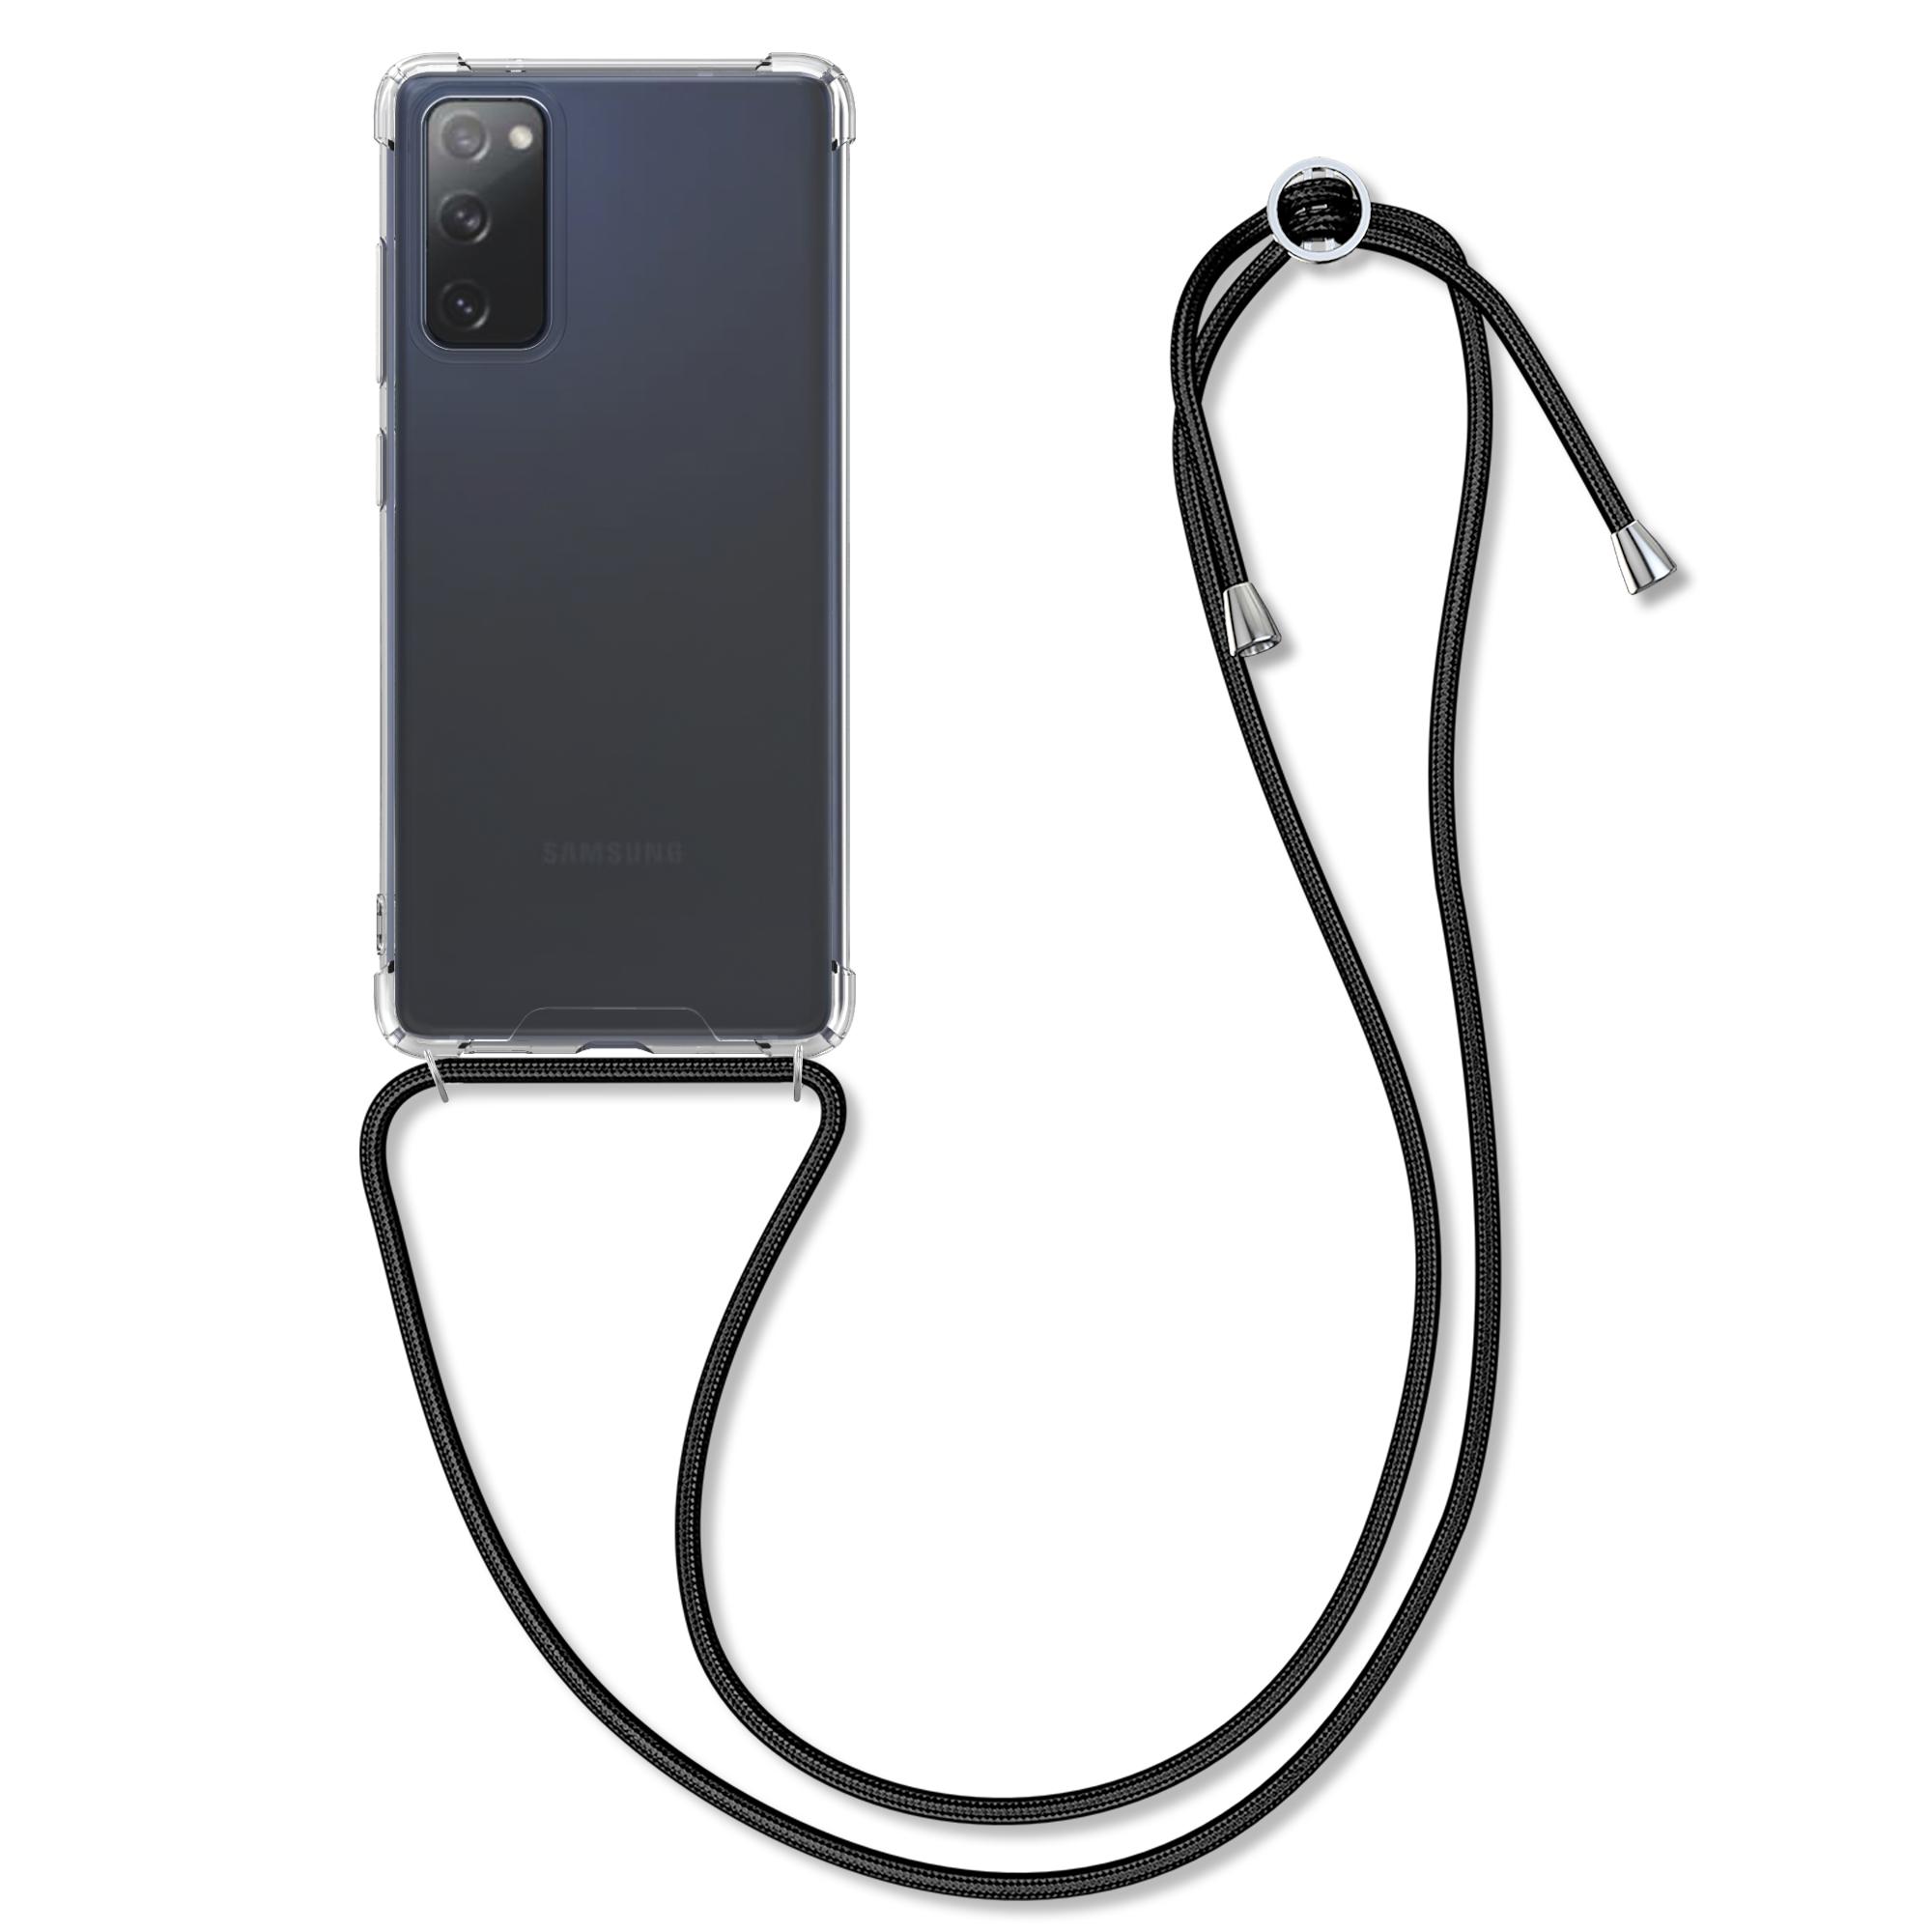 Silikonové pouzdro / obal na krk pro Samsung S20 FE